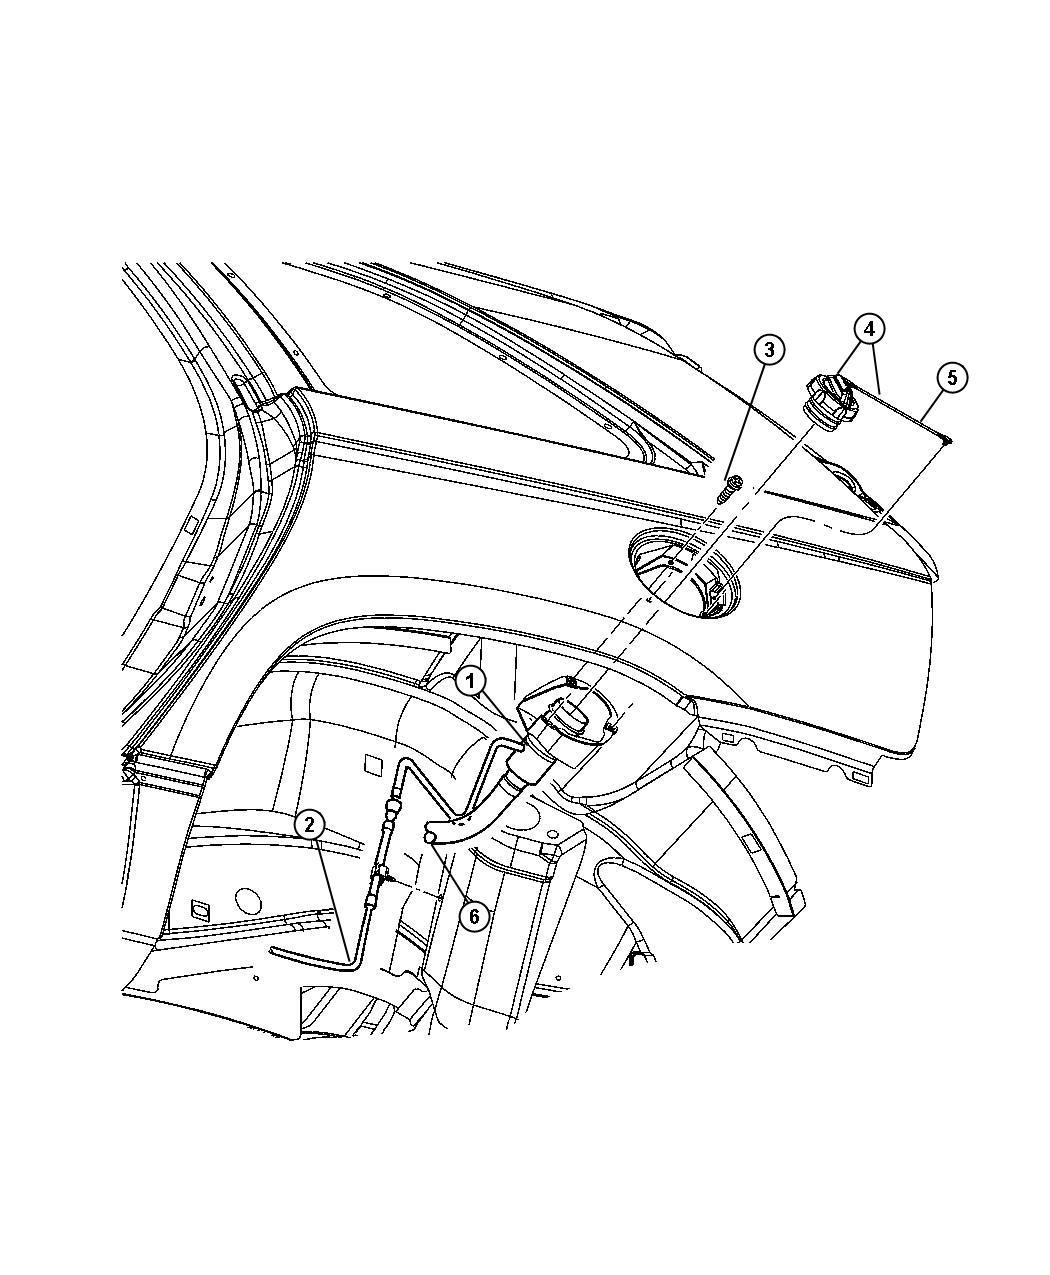 2008 Chrysler Pacifica Tube. Fuel filler. Tank, related